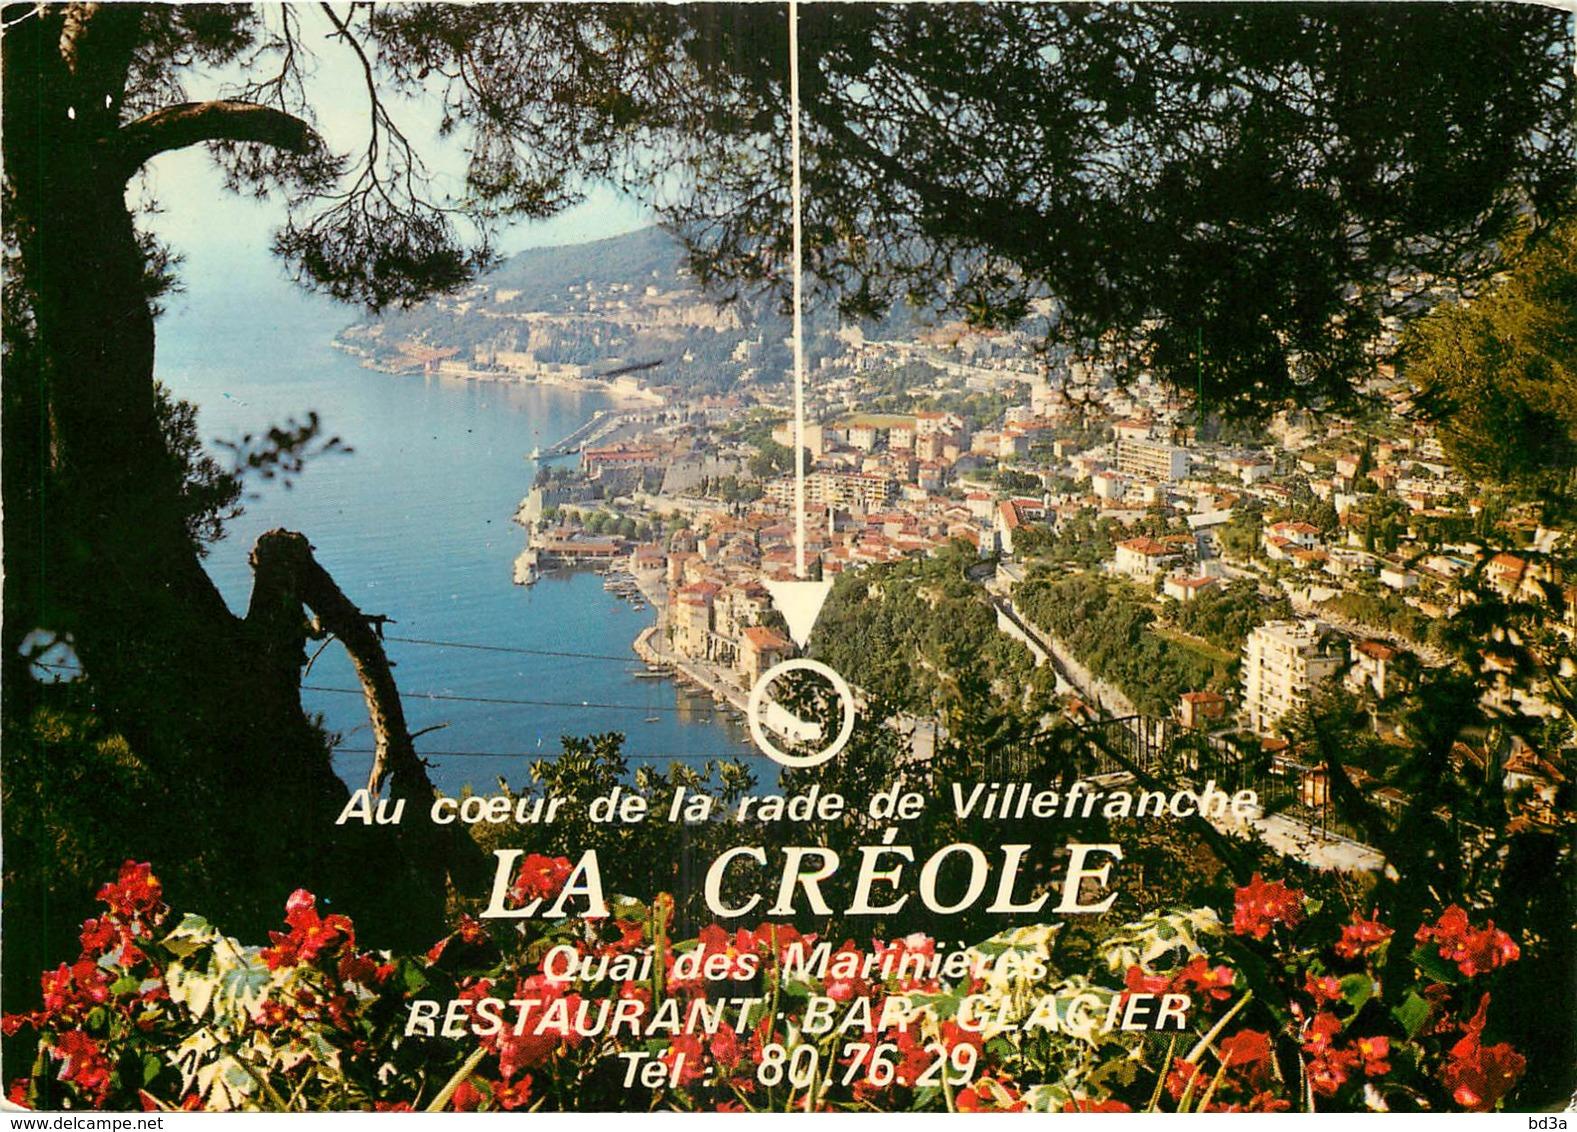 06 - VILLEFRANCHE SUR MER - LA CREOLE - Villefranche-sur-Mer